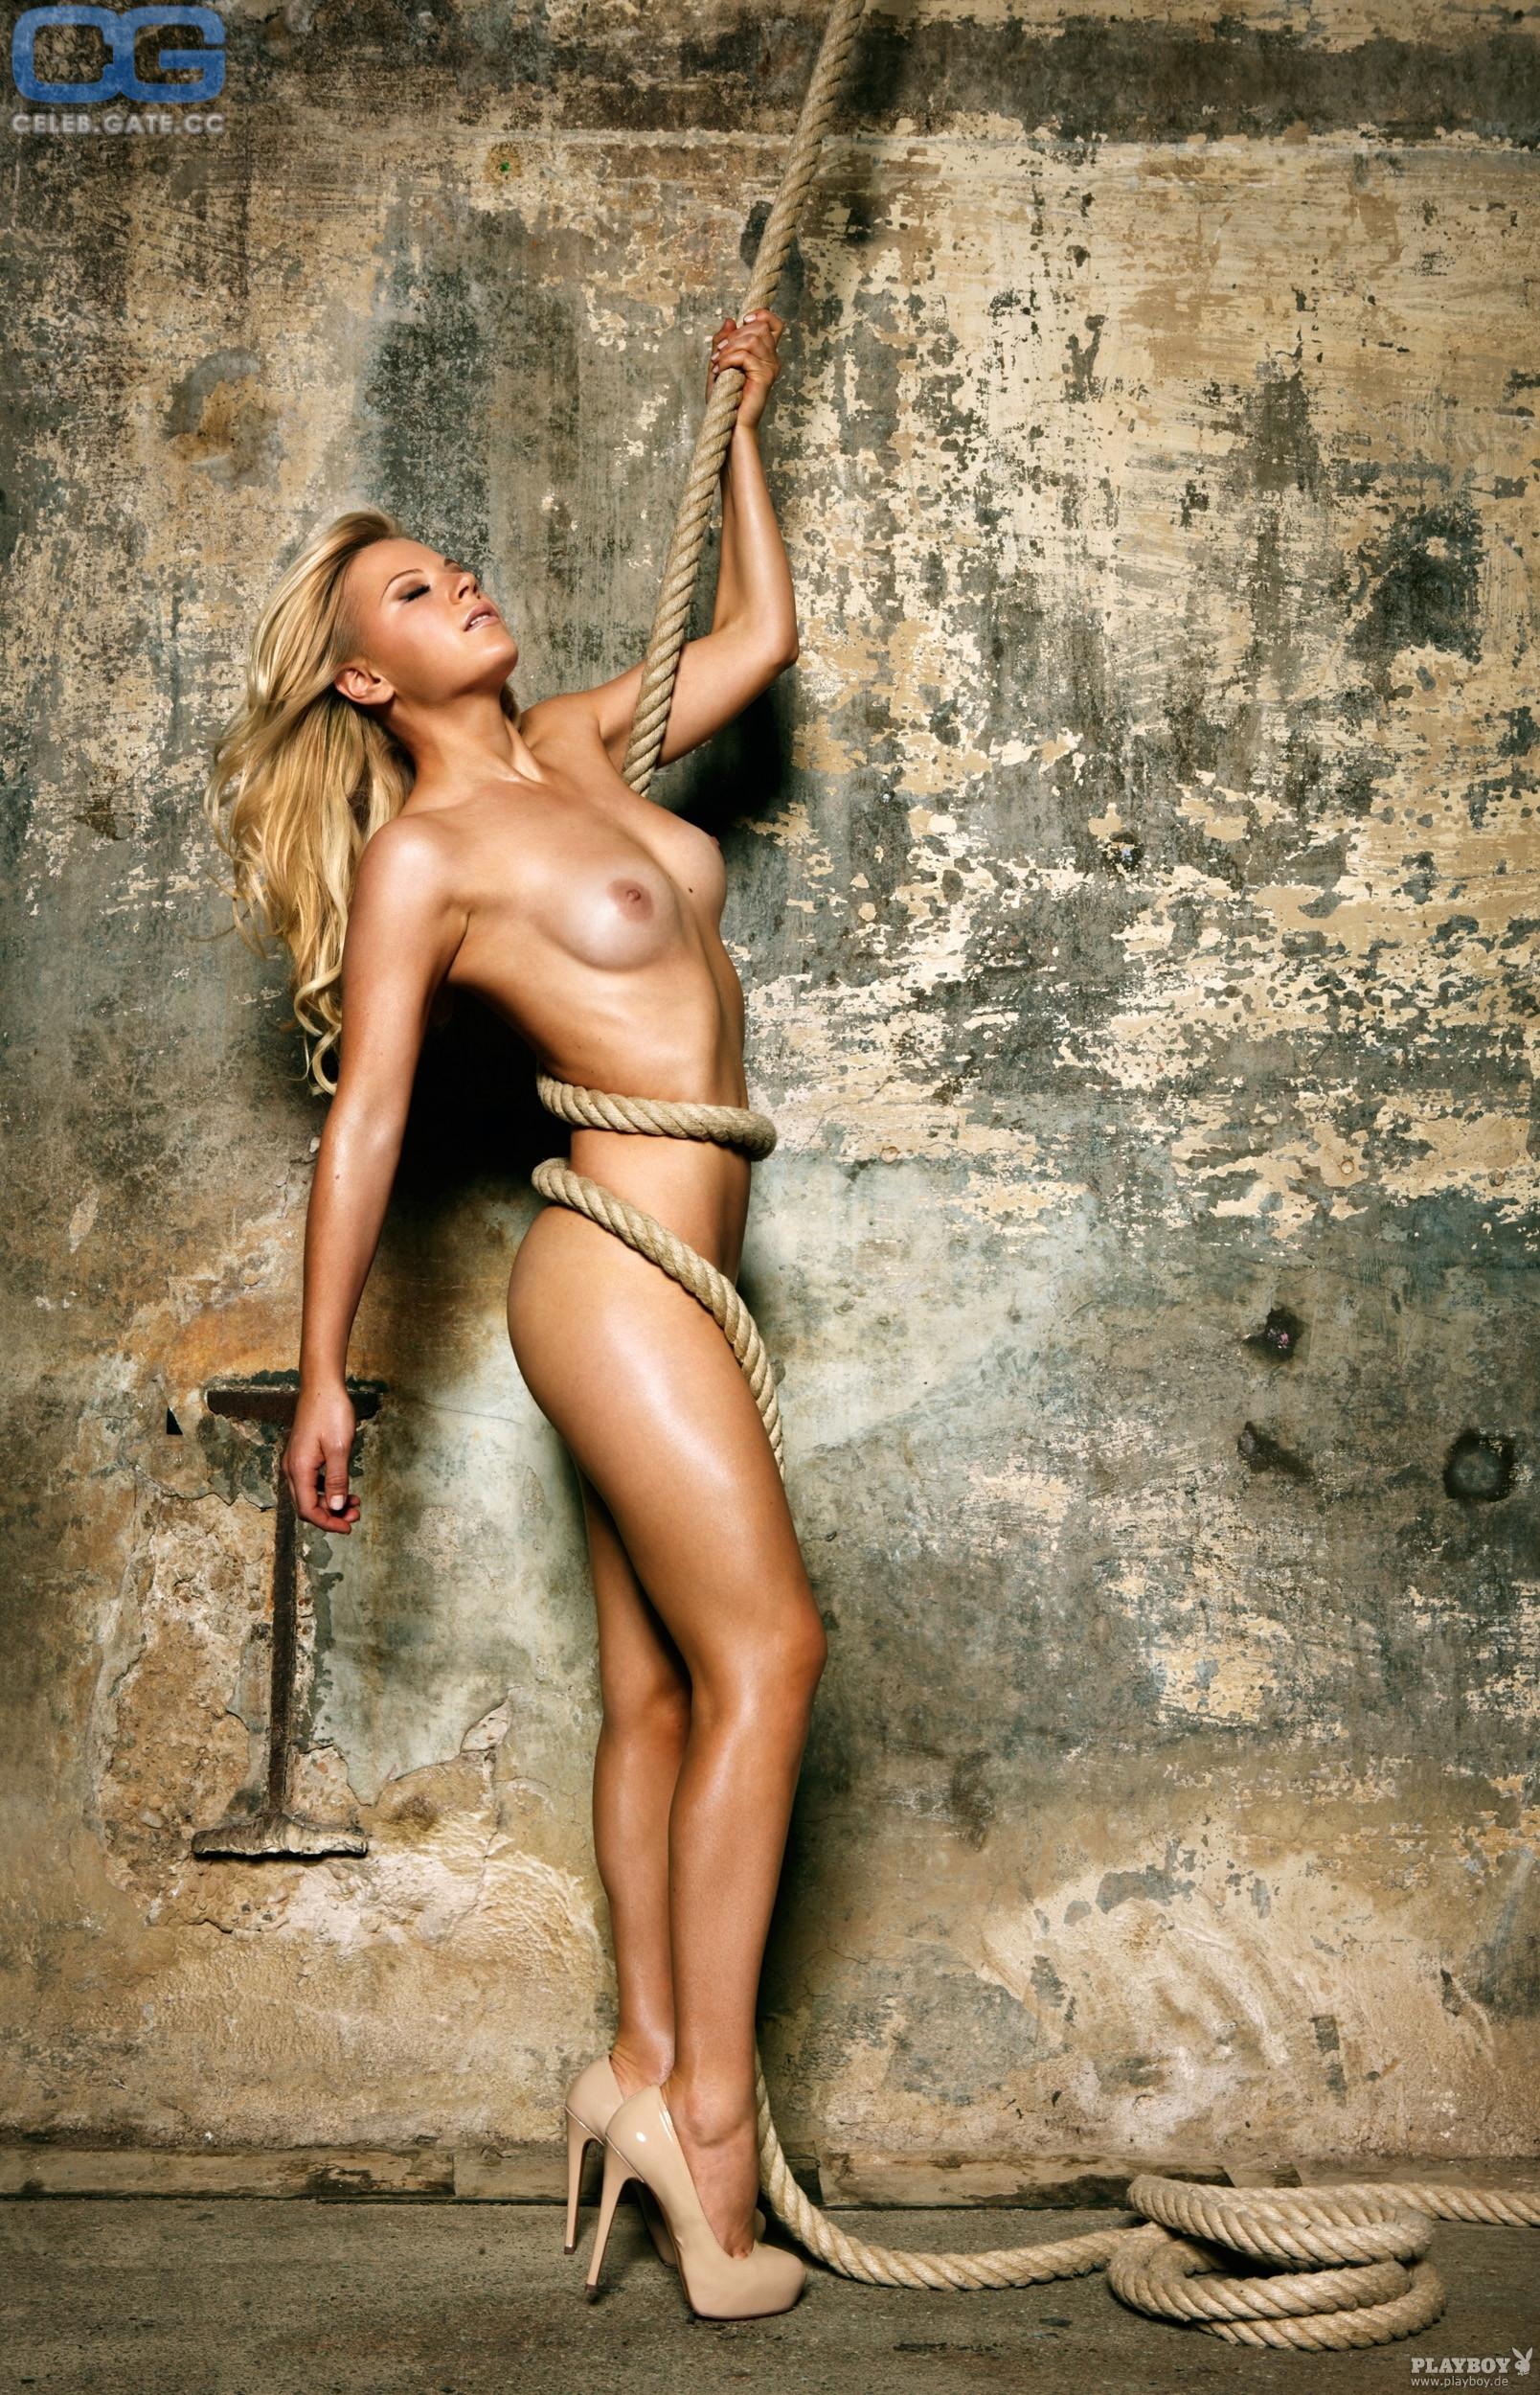 Playboy nackt miriam gössner PLAYBOY MIRIAM